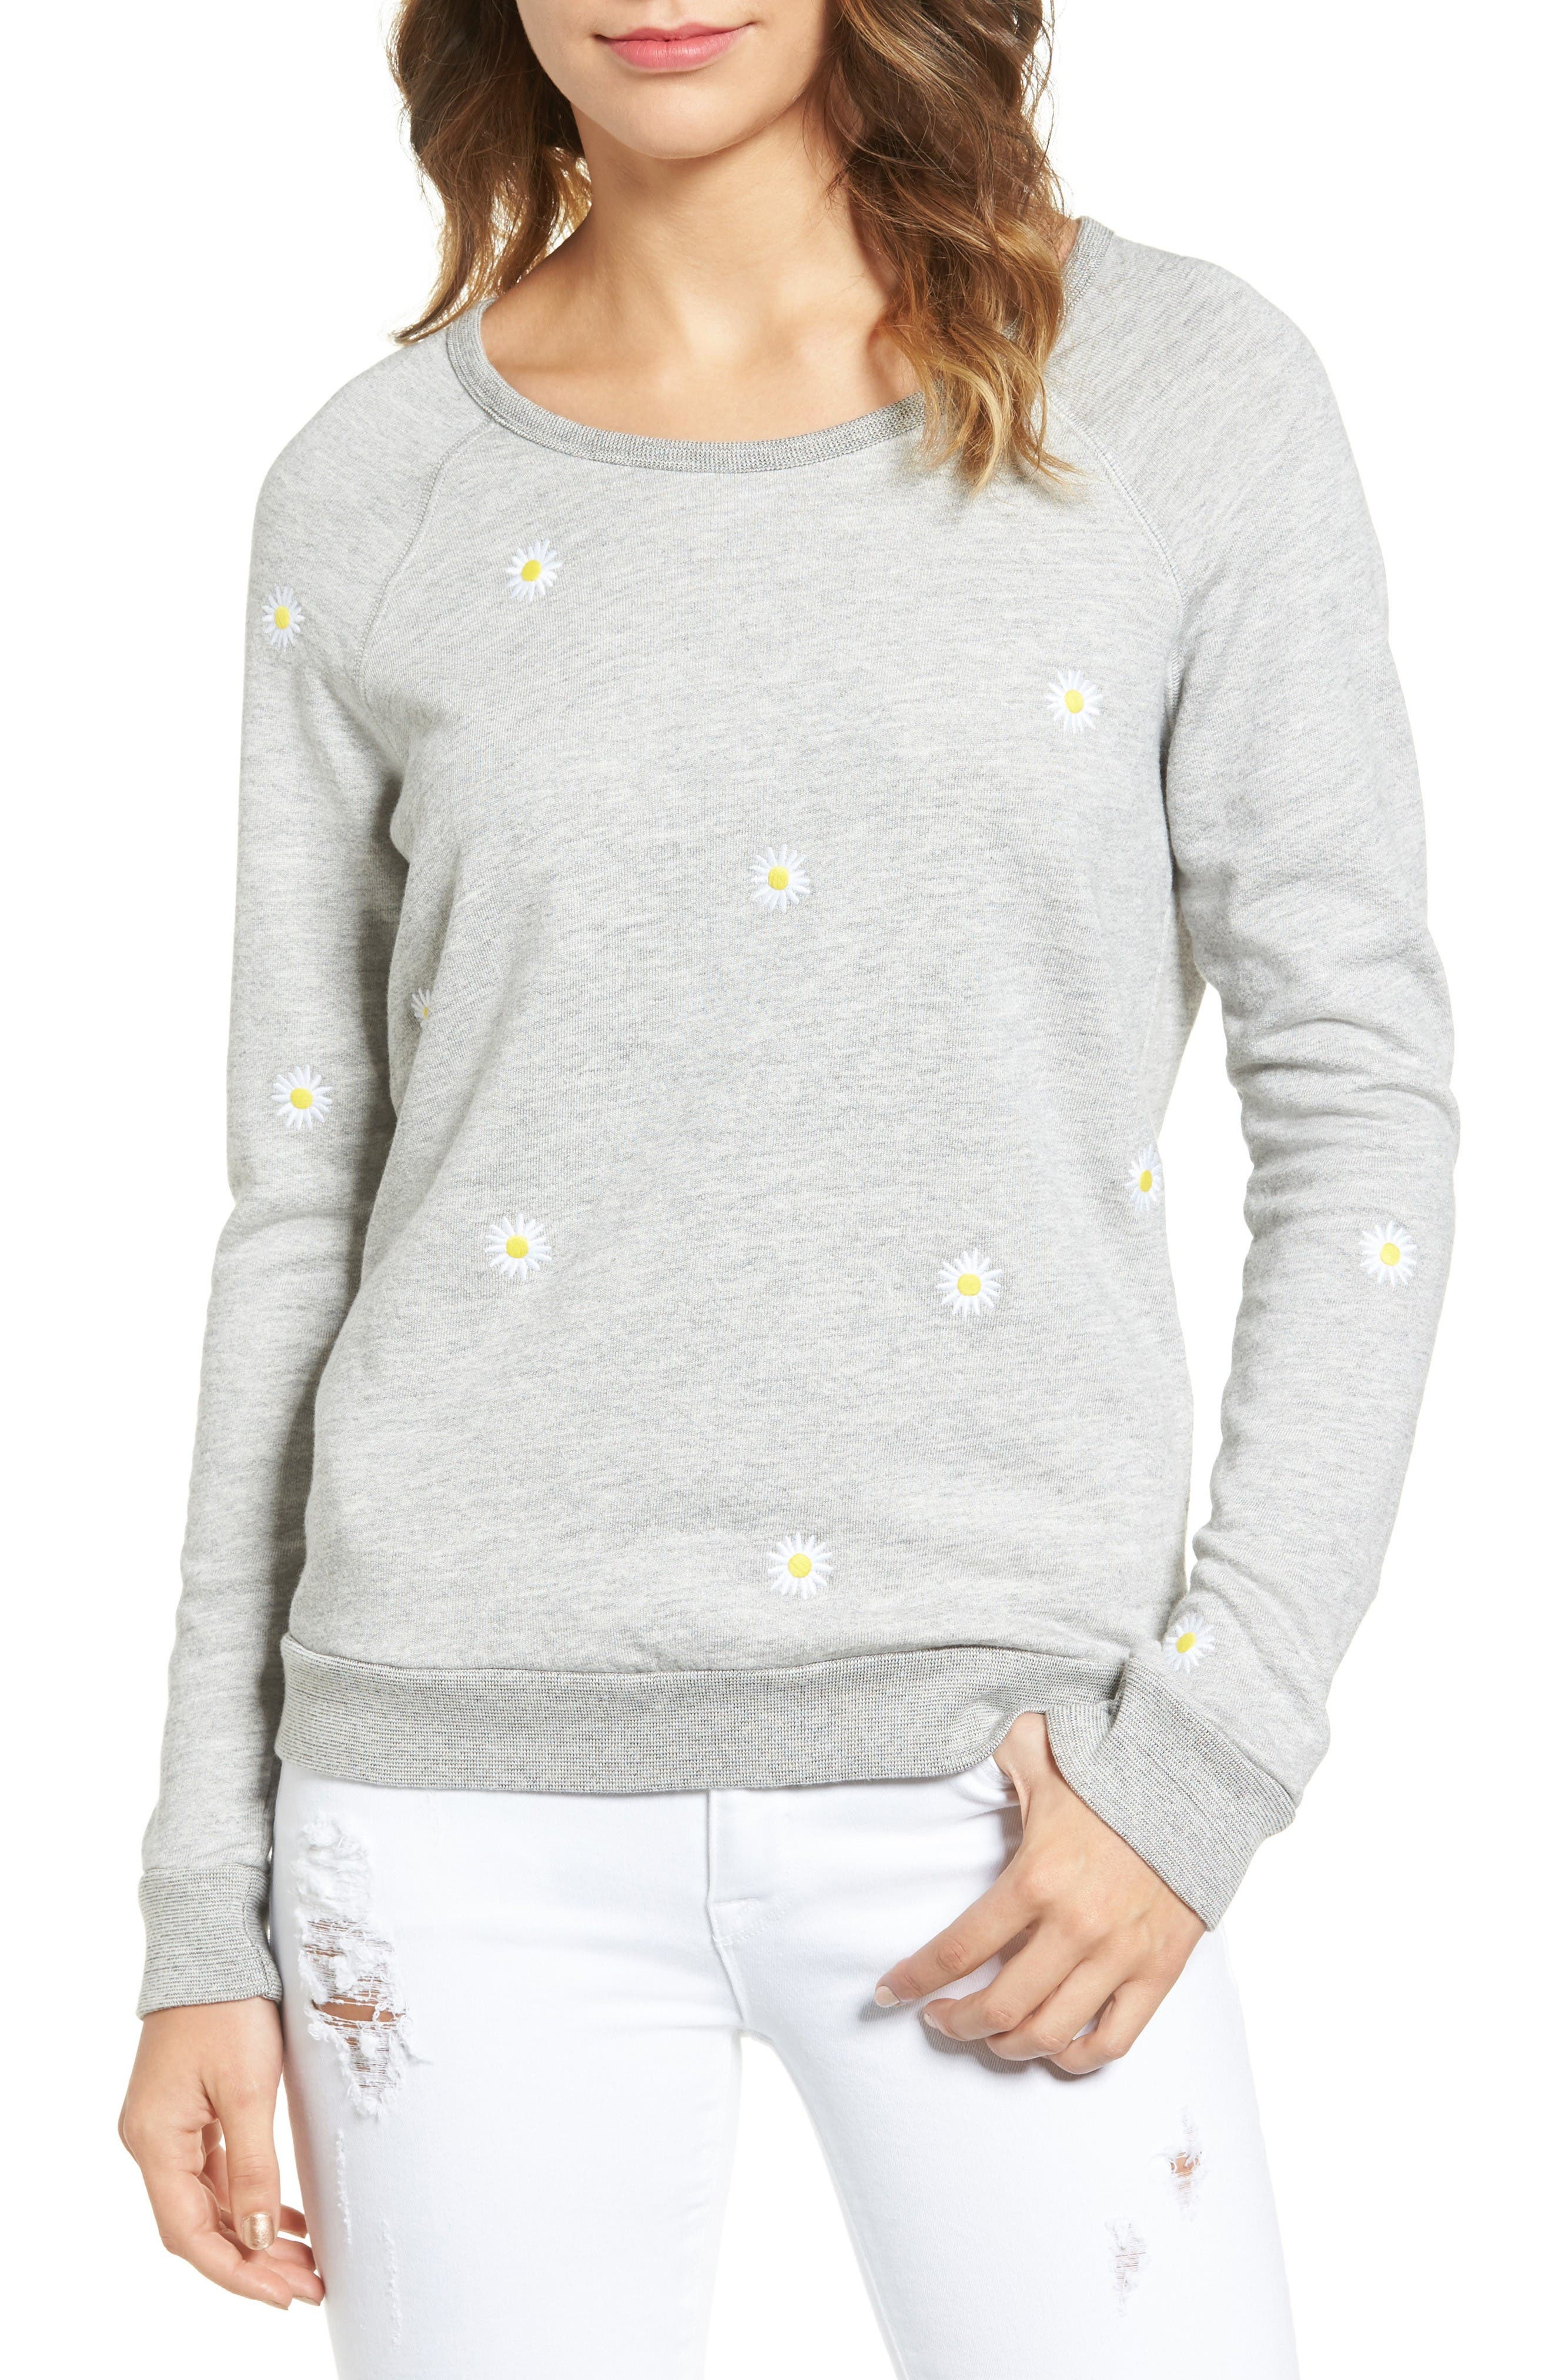 Sundry Daisies Embroidered Sweatshirt